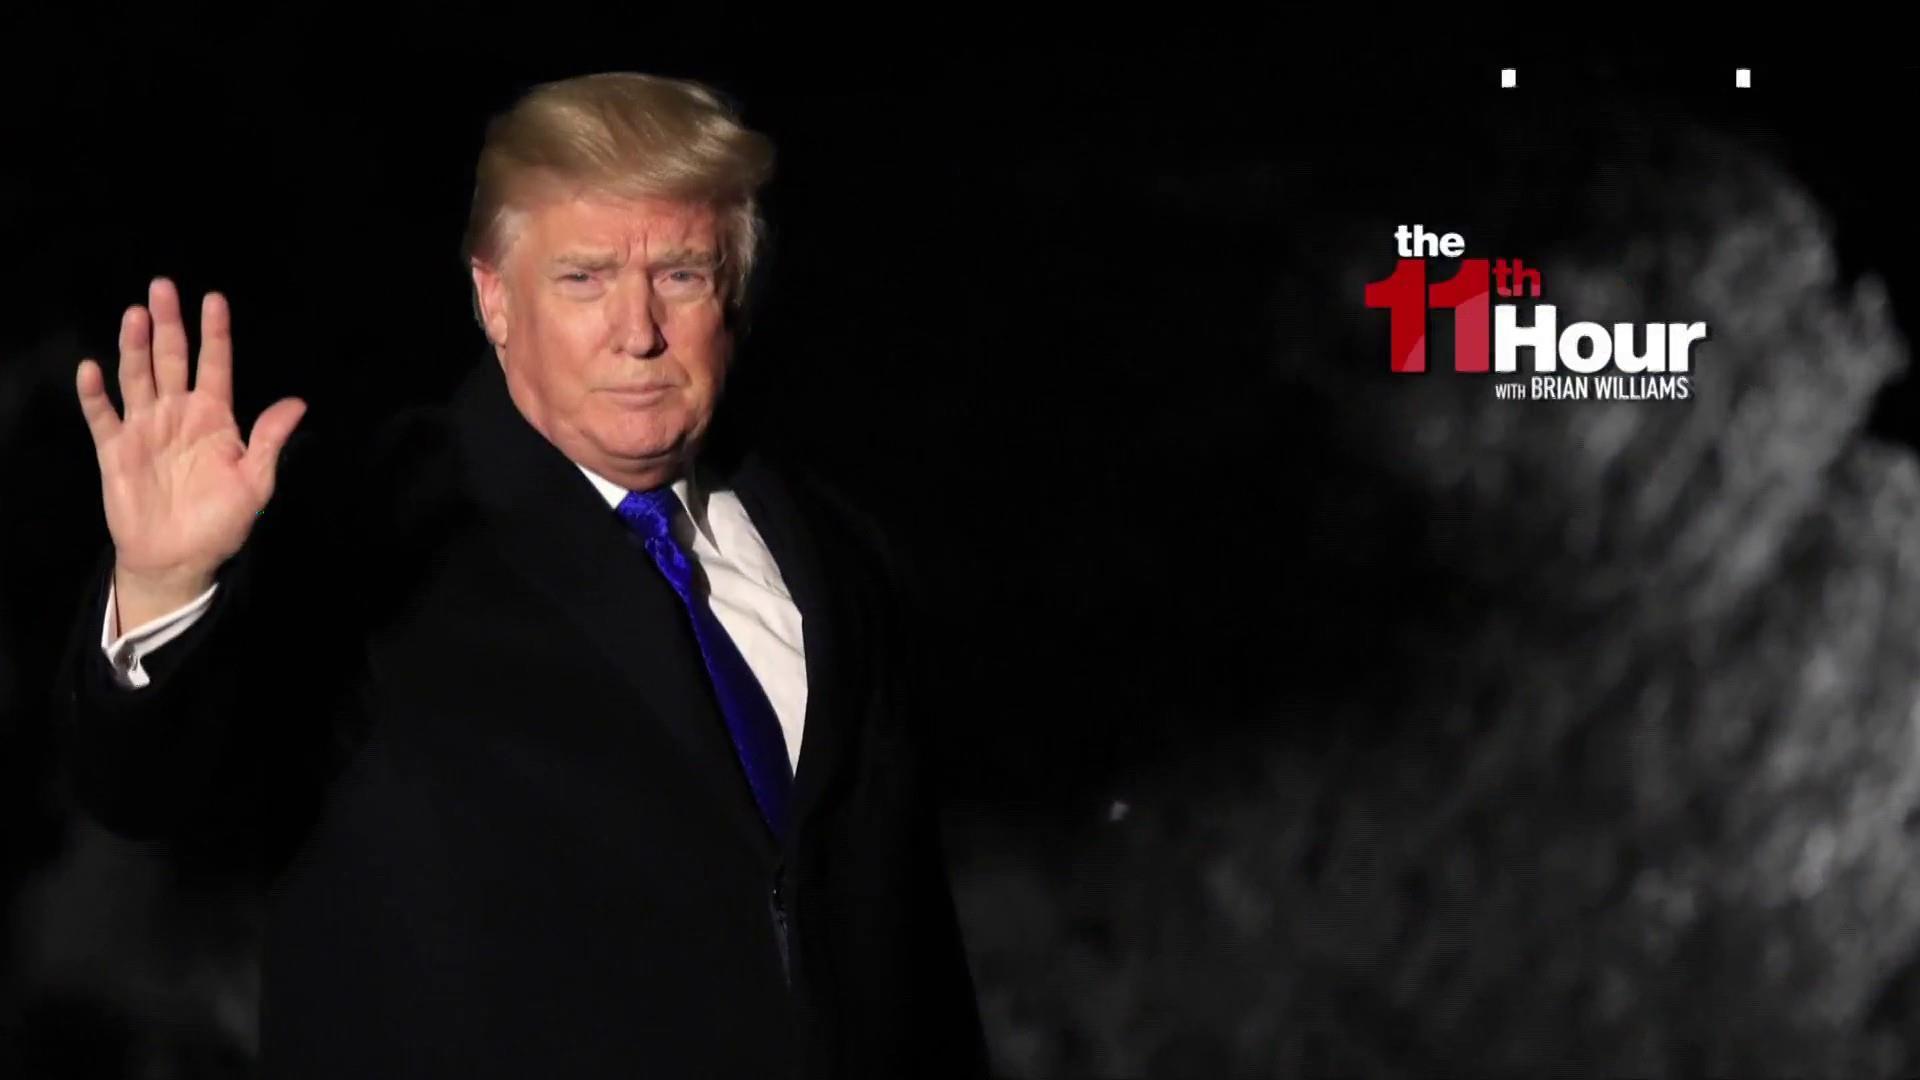 Big Russia news breaks (again) with Trump overseas